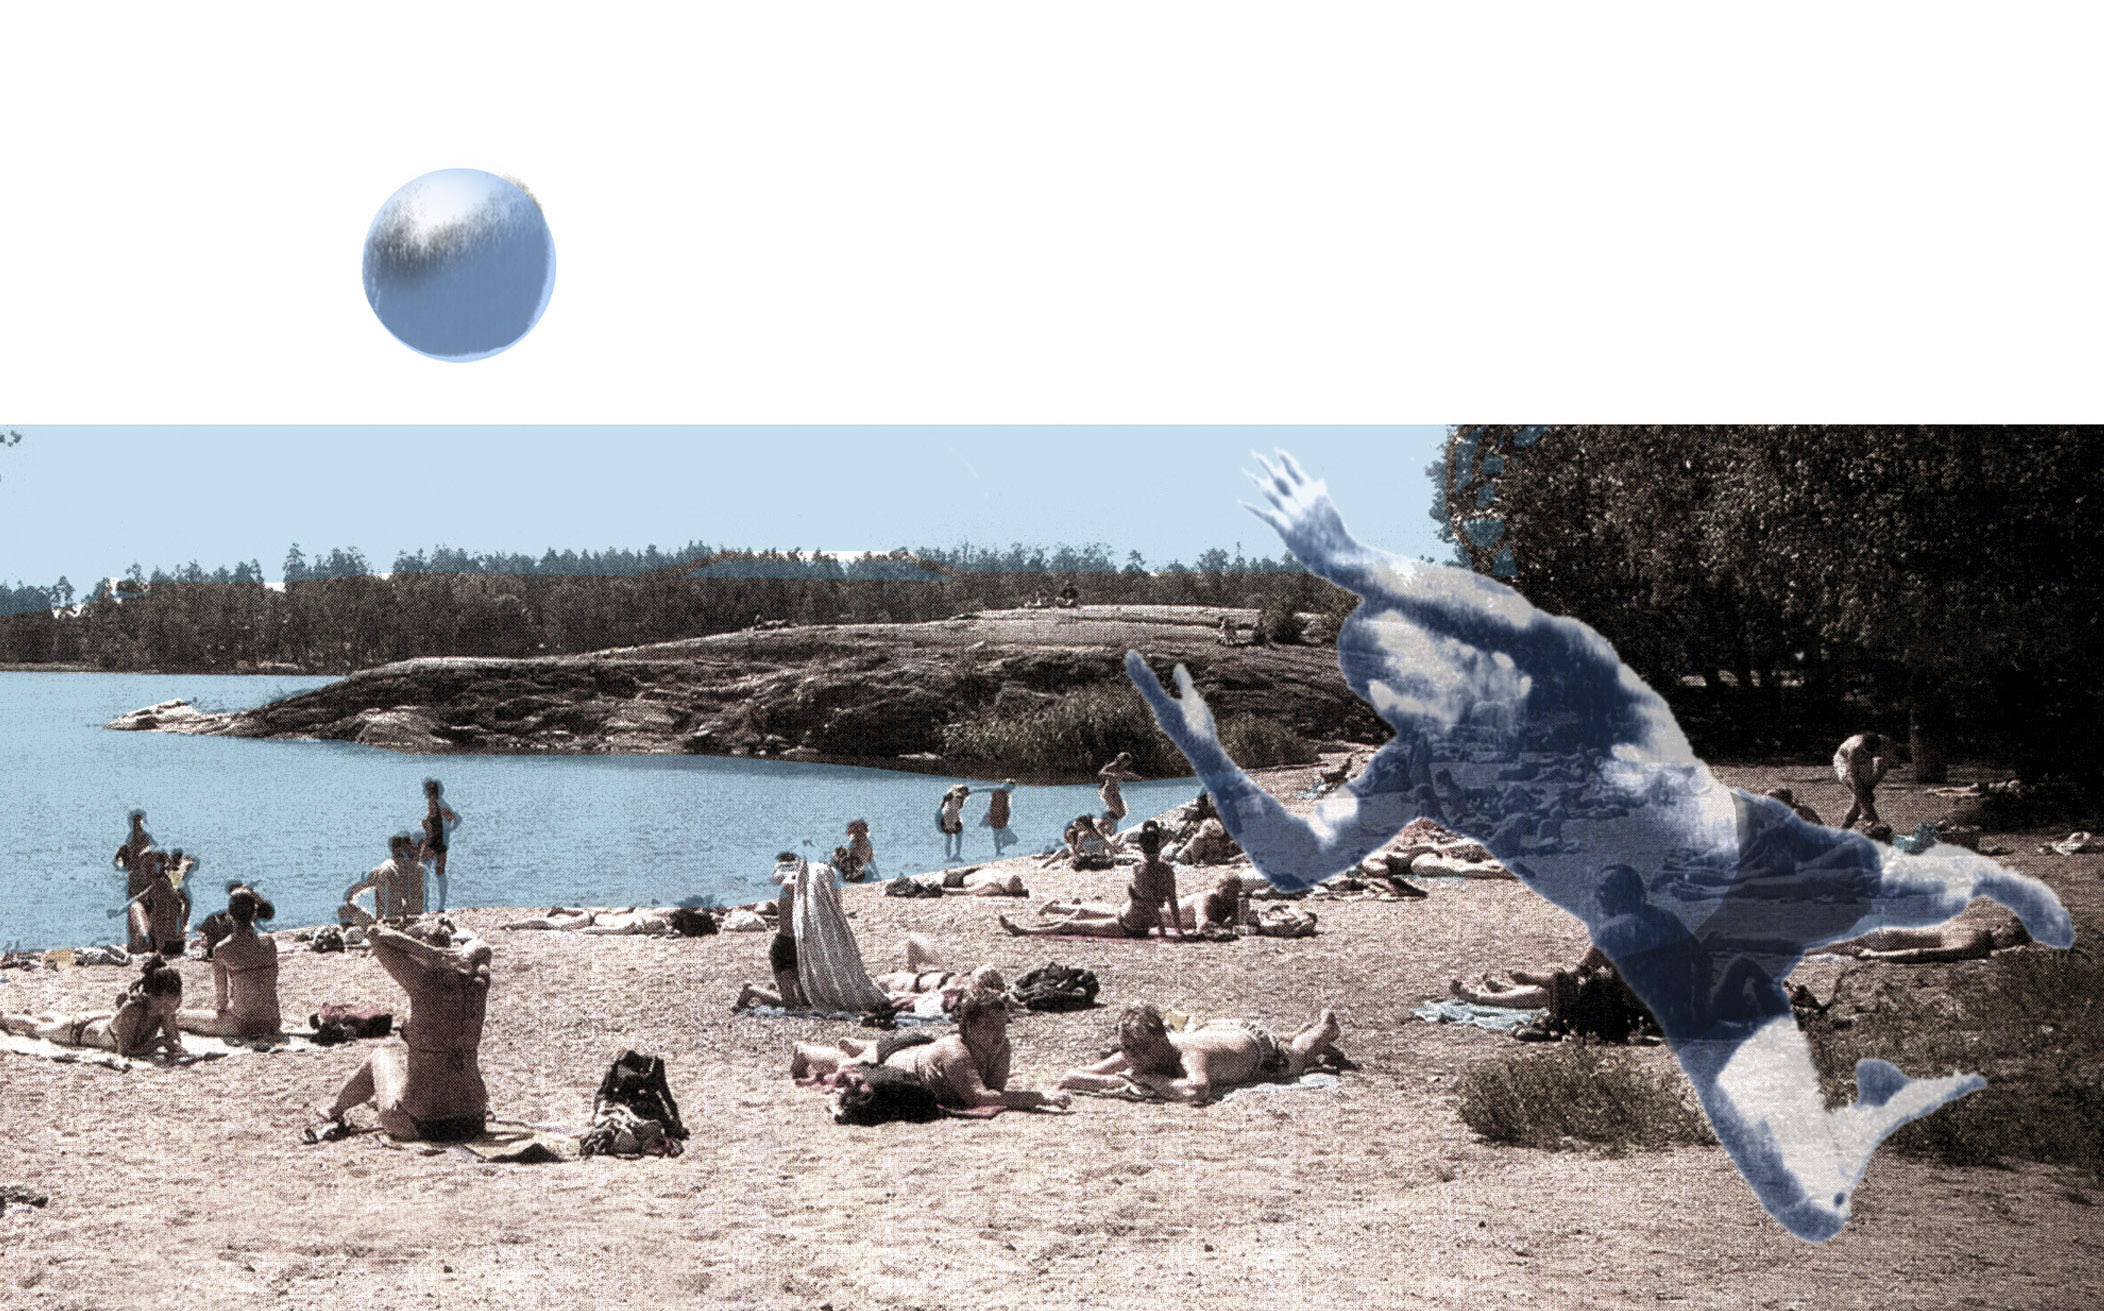 Helsinki 2050 vision